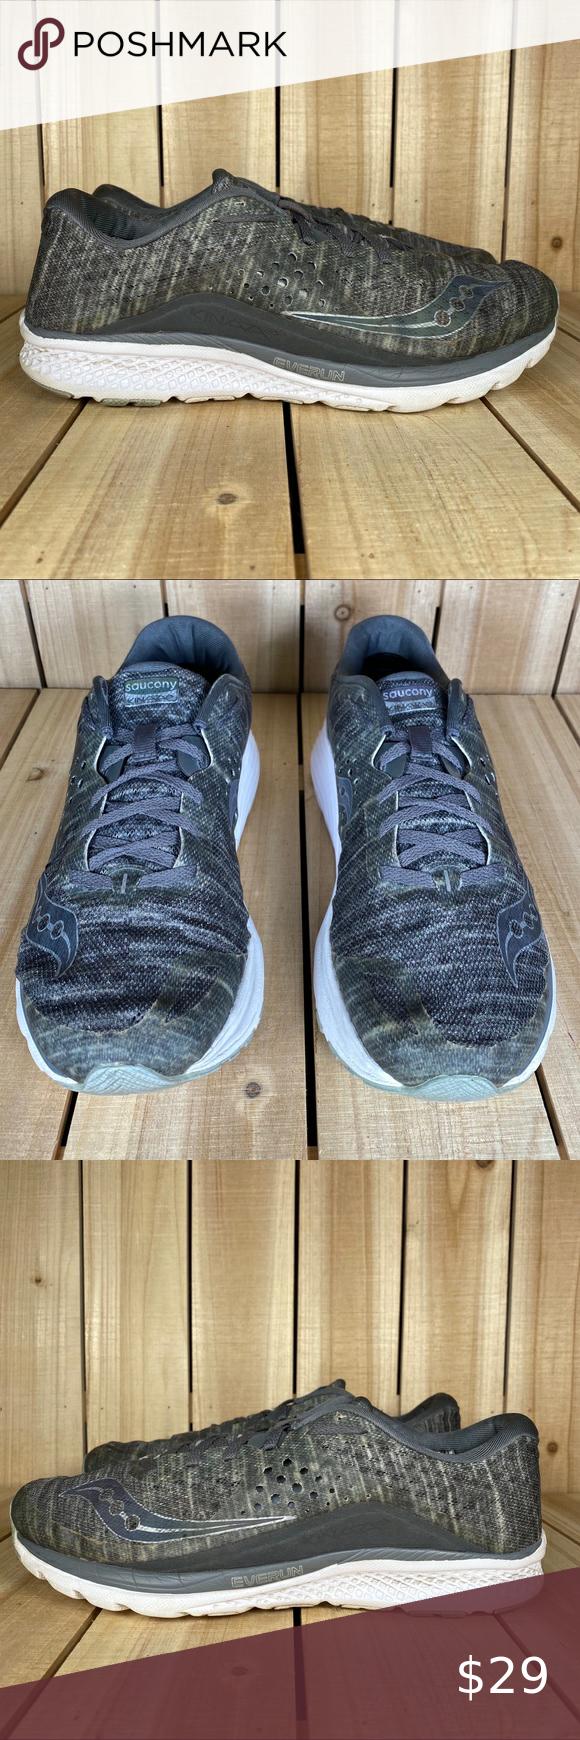 Saucony Kinvara 8 Running Shoes Saucony